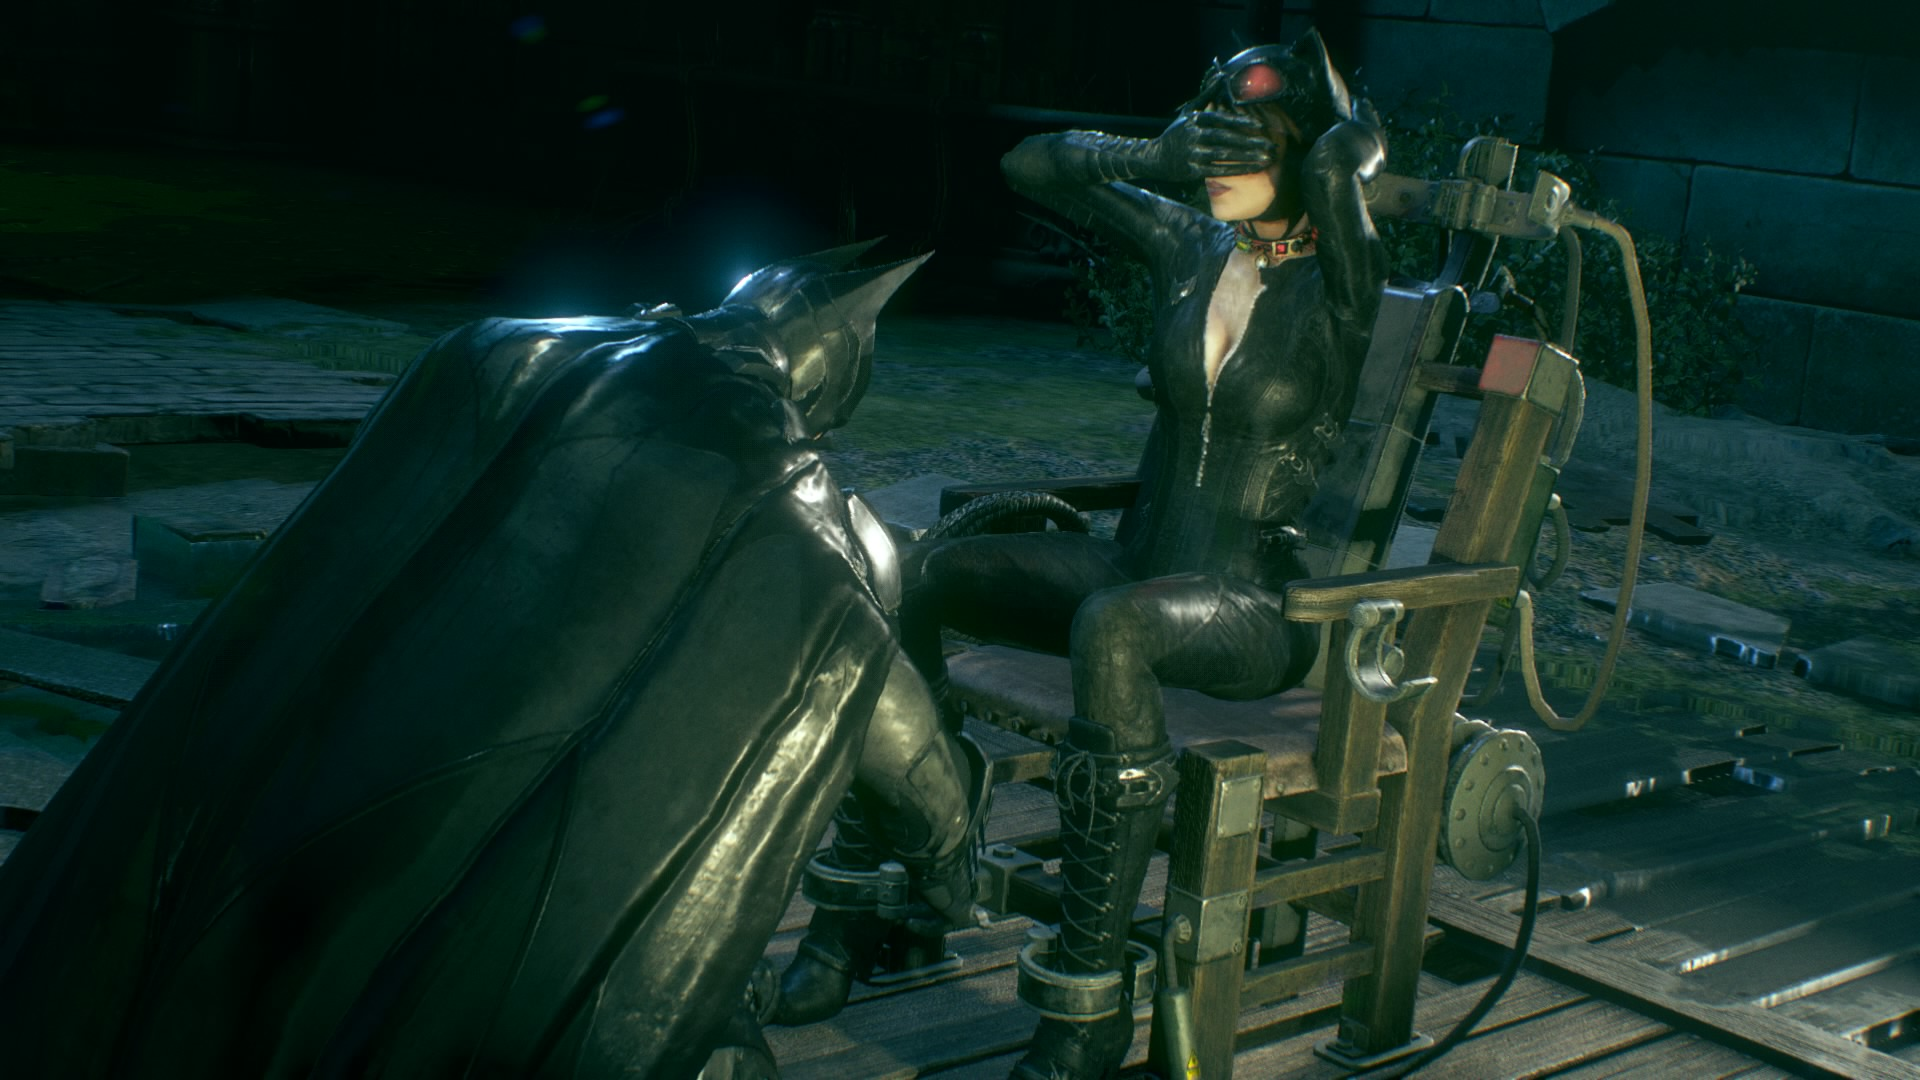 Recenze: Batman Arkham Knight – Strach nad Gothamem 10714